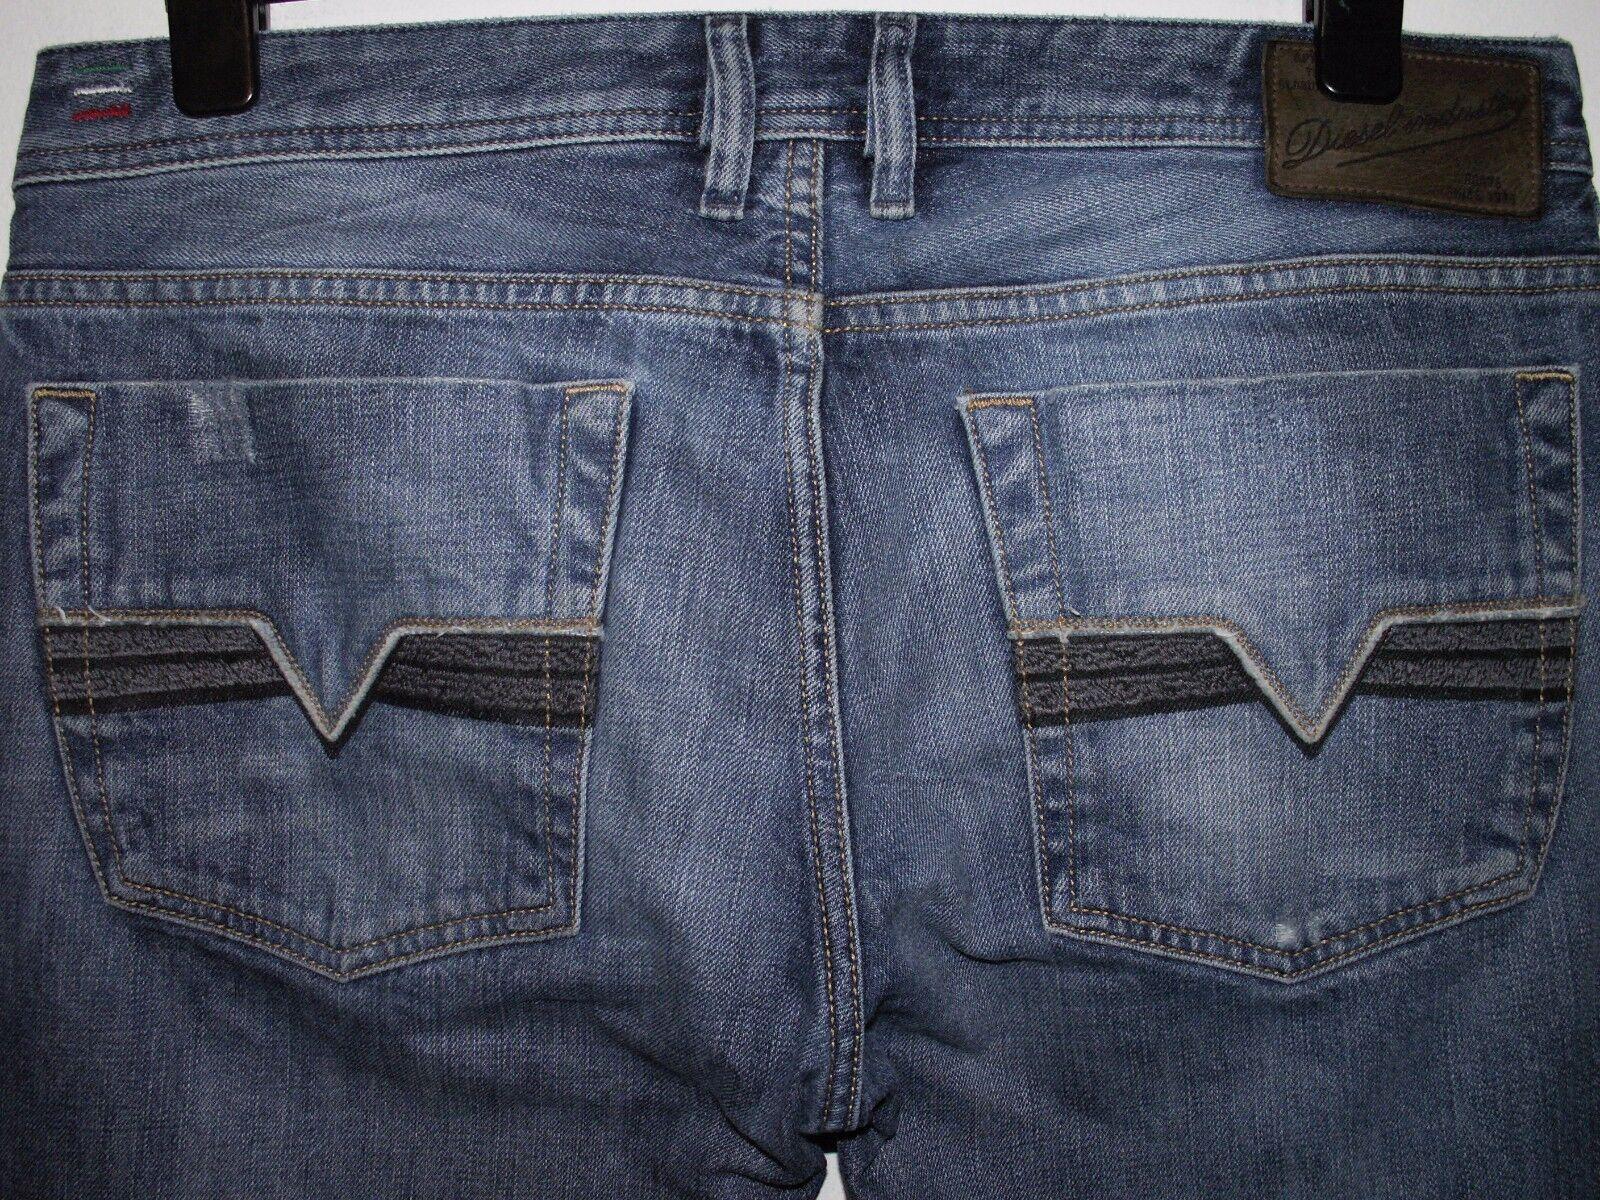 Diesel zatiny bootcut jeans wash 008LD W34 L30 (a2186)